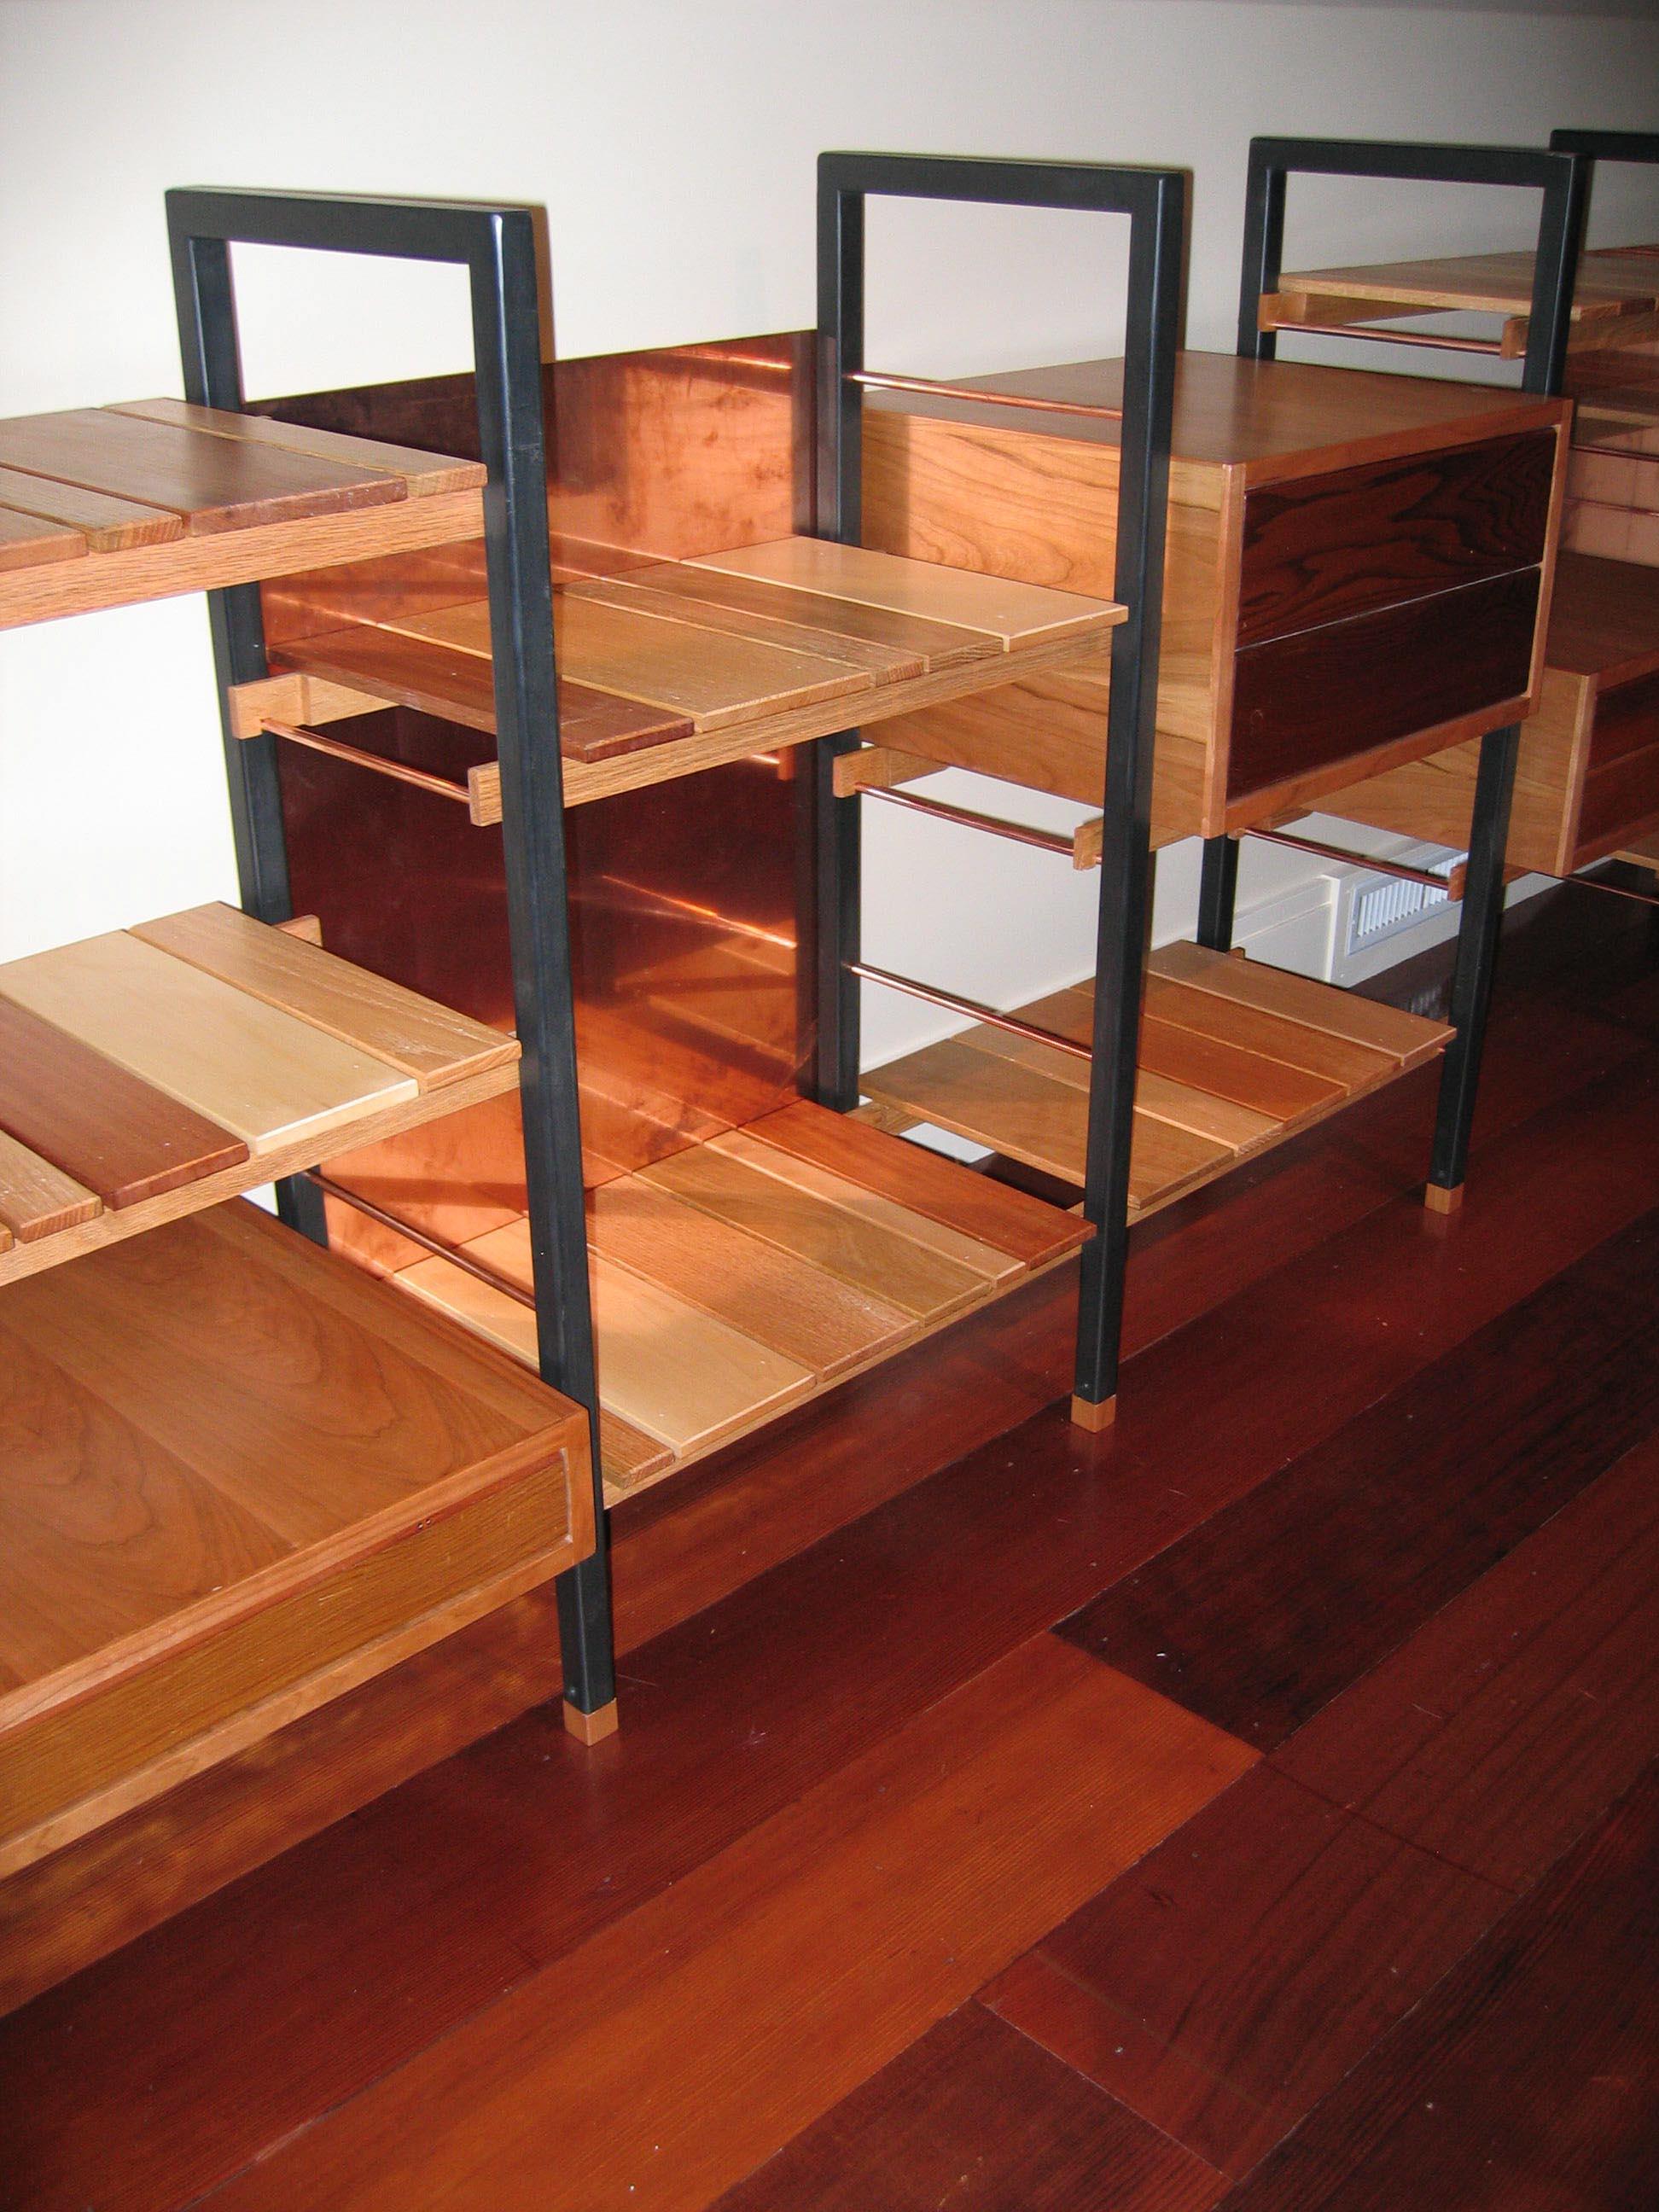 shelf system.jpeg